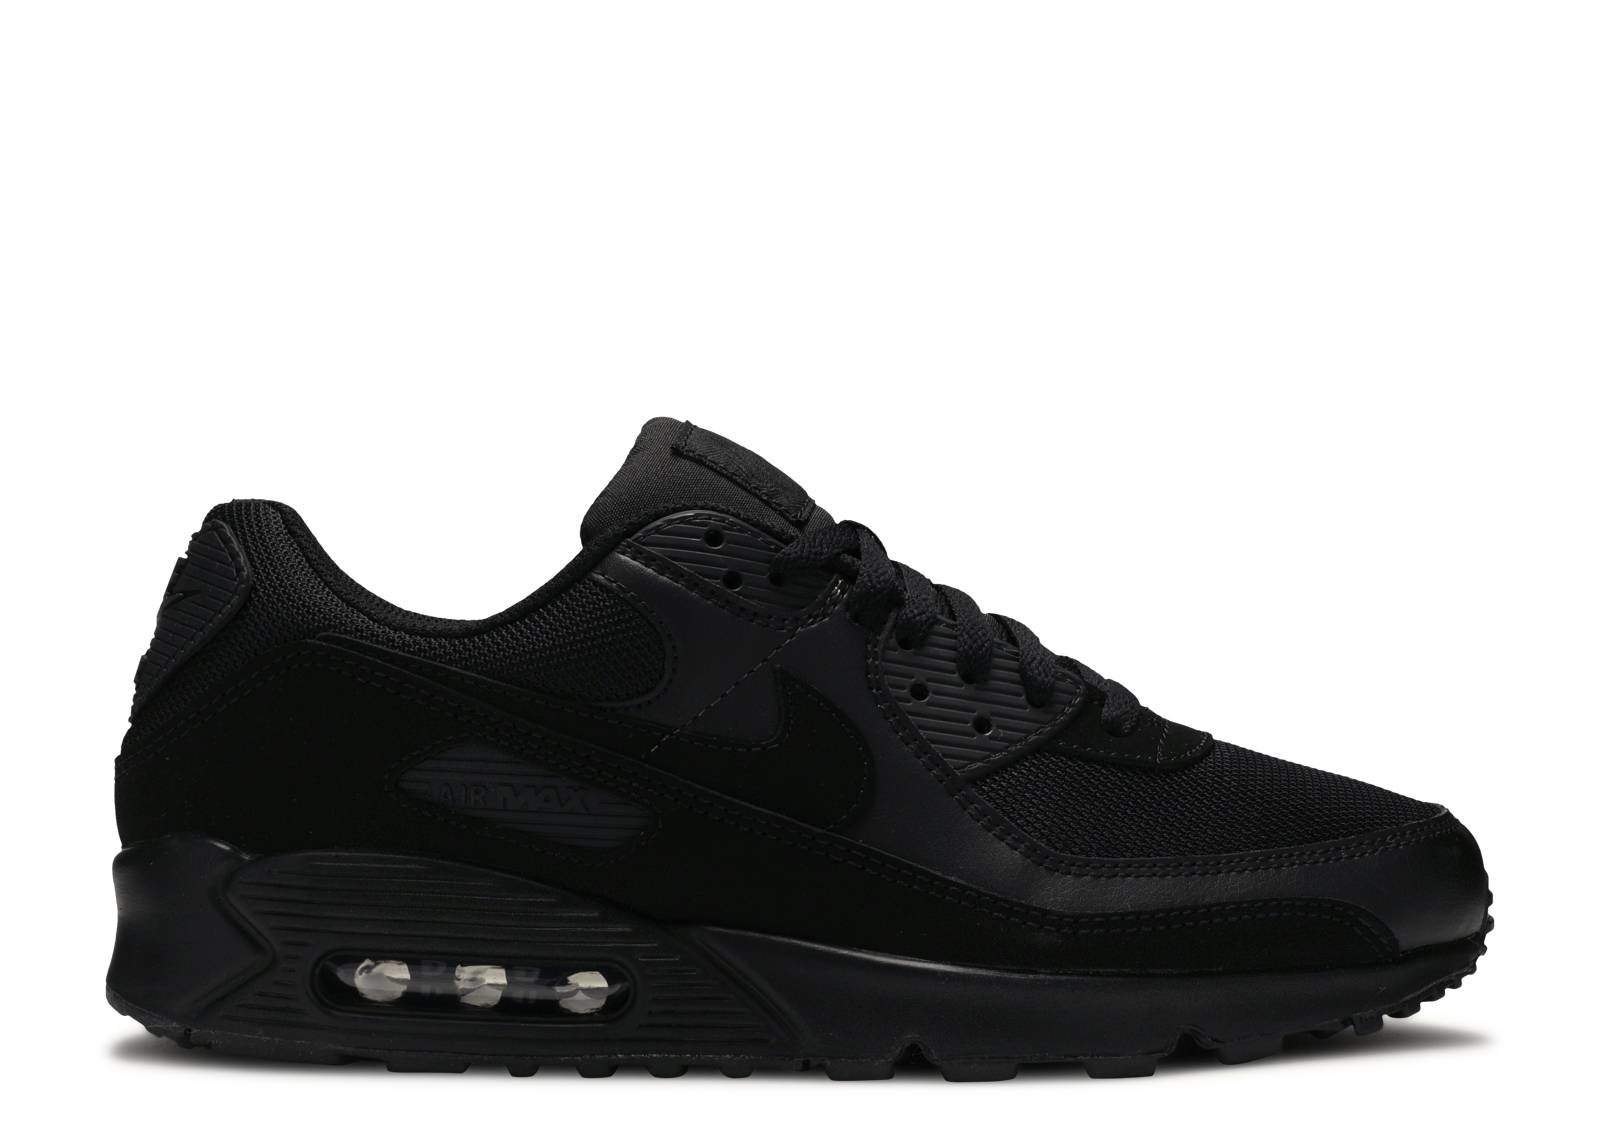 Nike Air Max 90 Sneakers | Flight Club